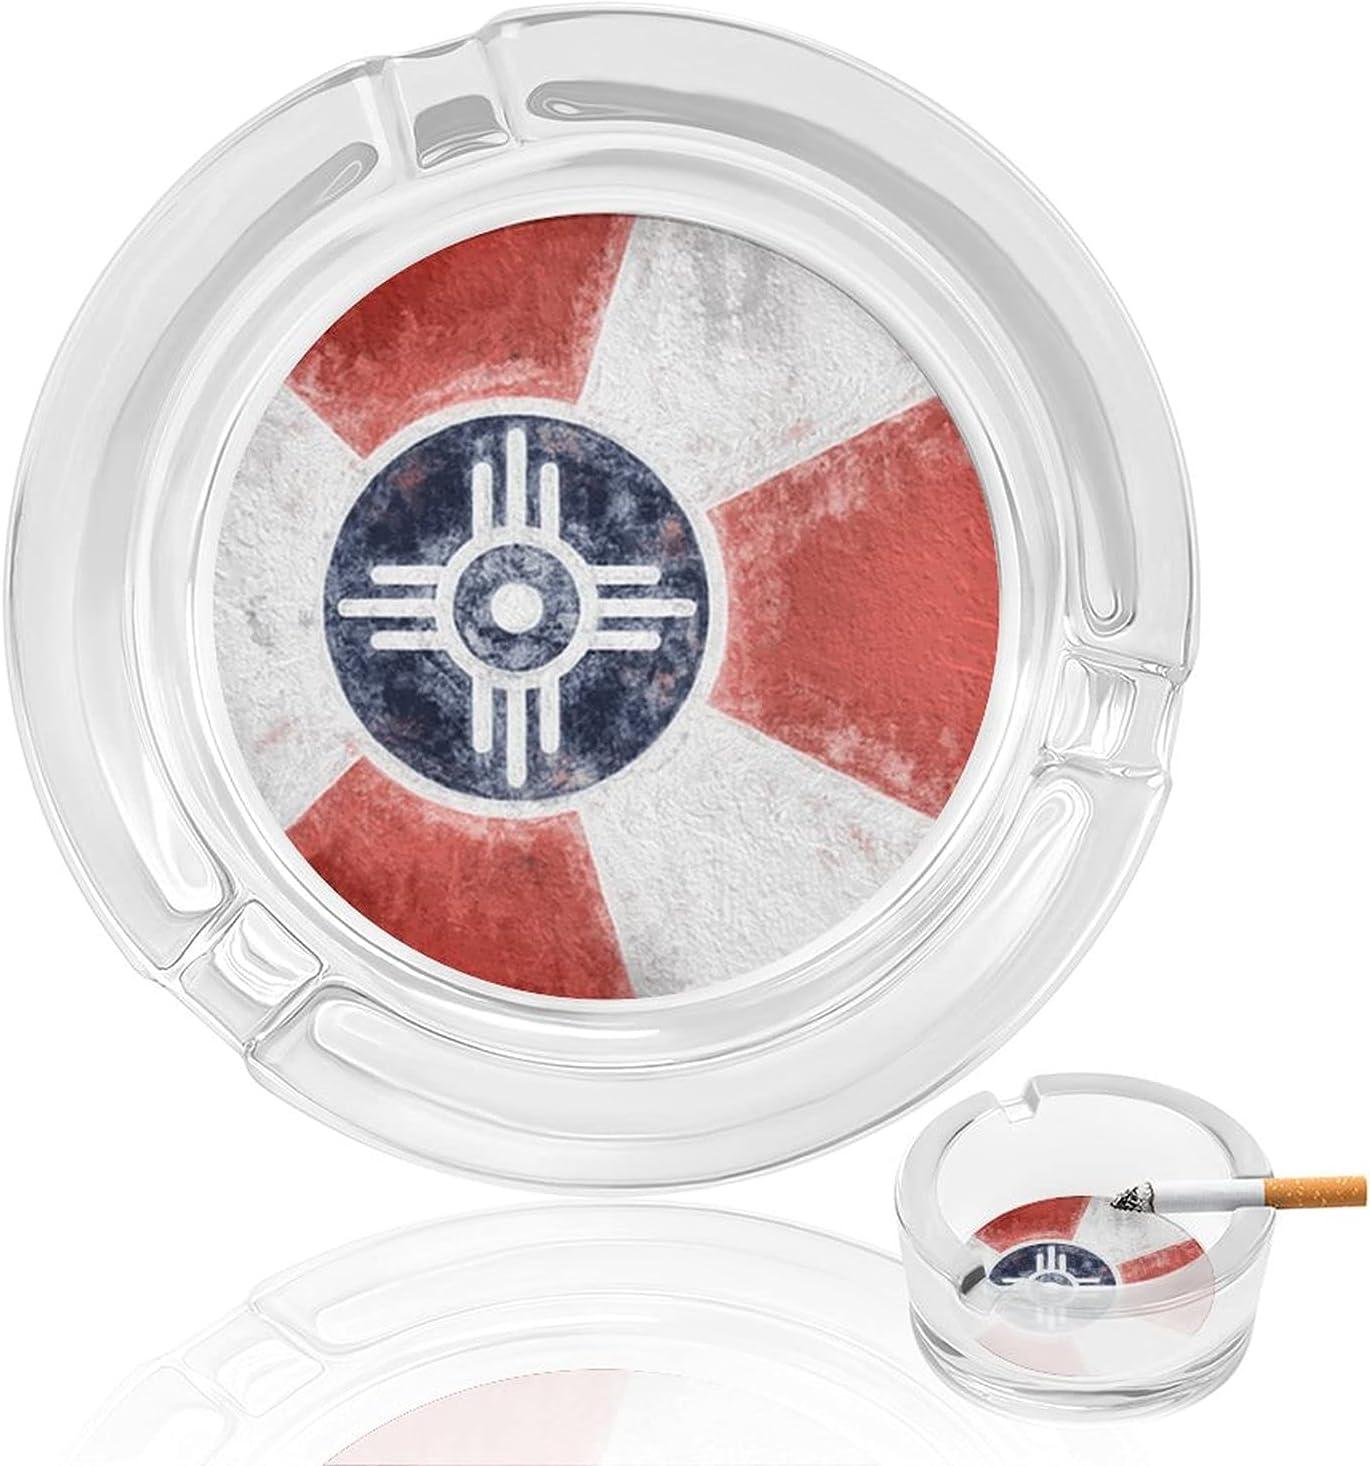 Flag Of Wichita Sale Kansas Smoking Glass Outlet SALE Ashtray Cigarette Ash Cigar